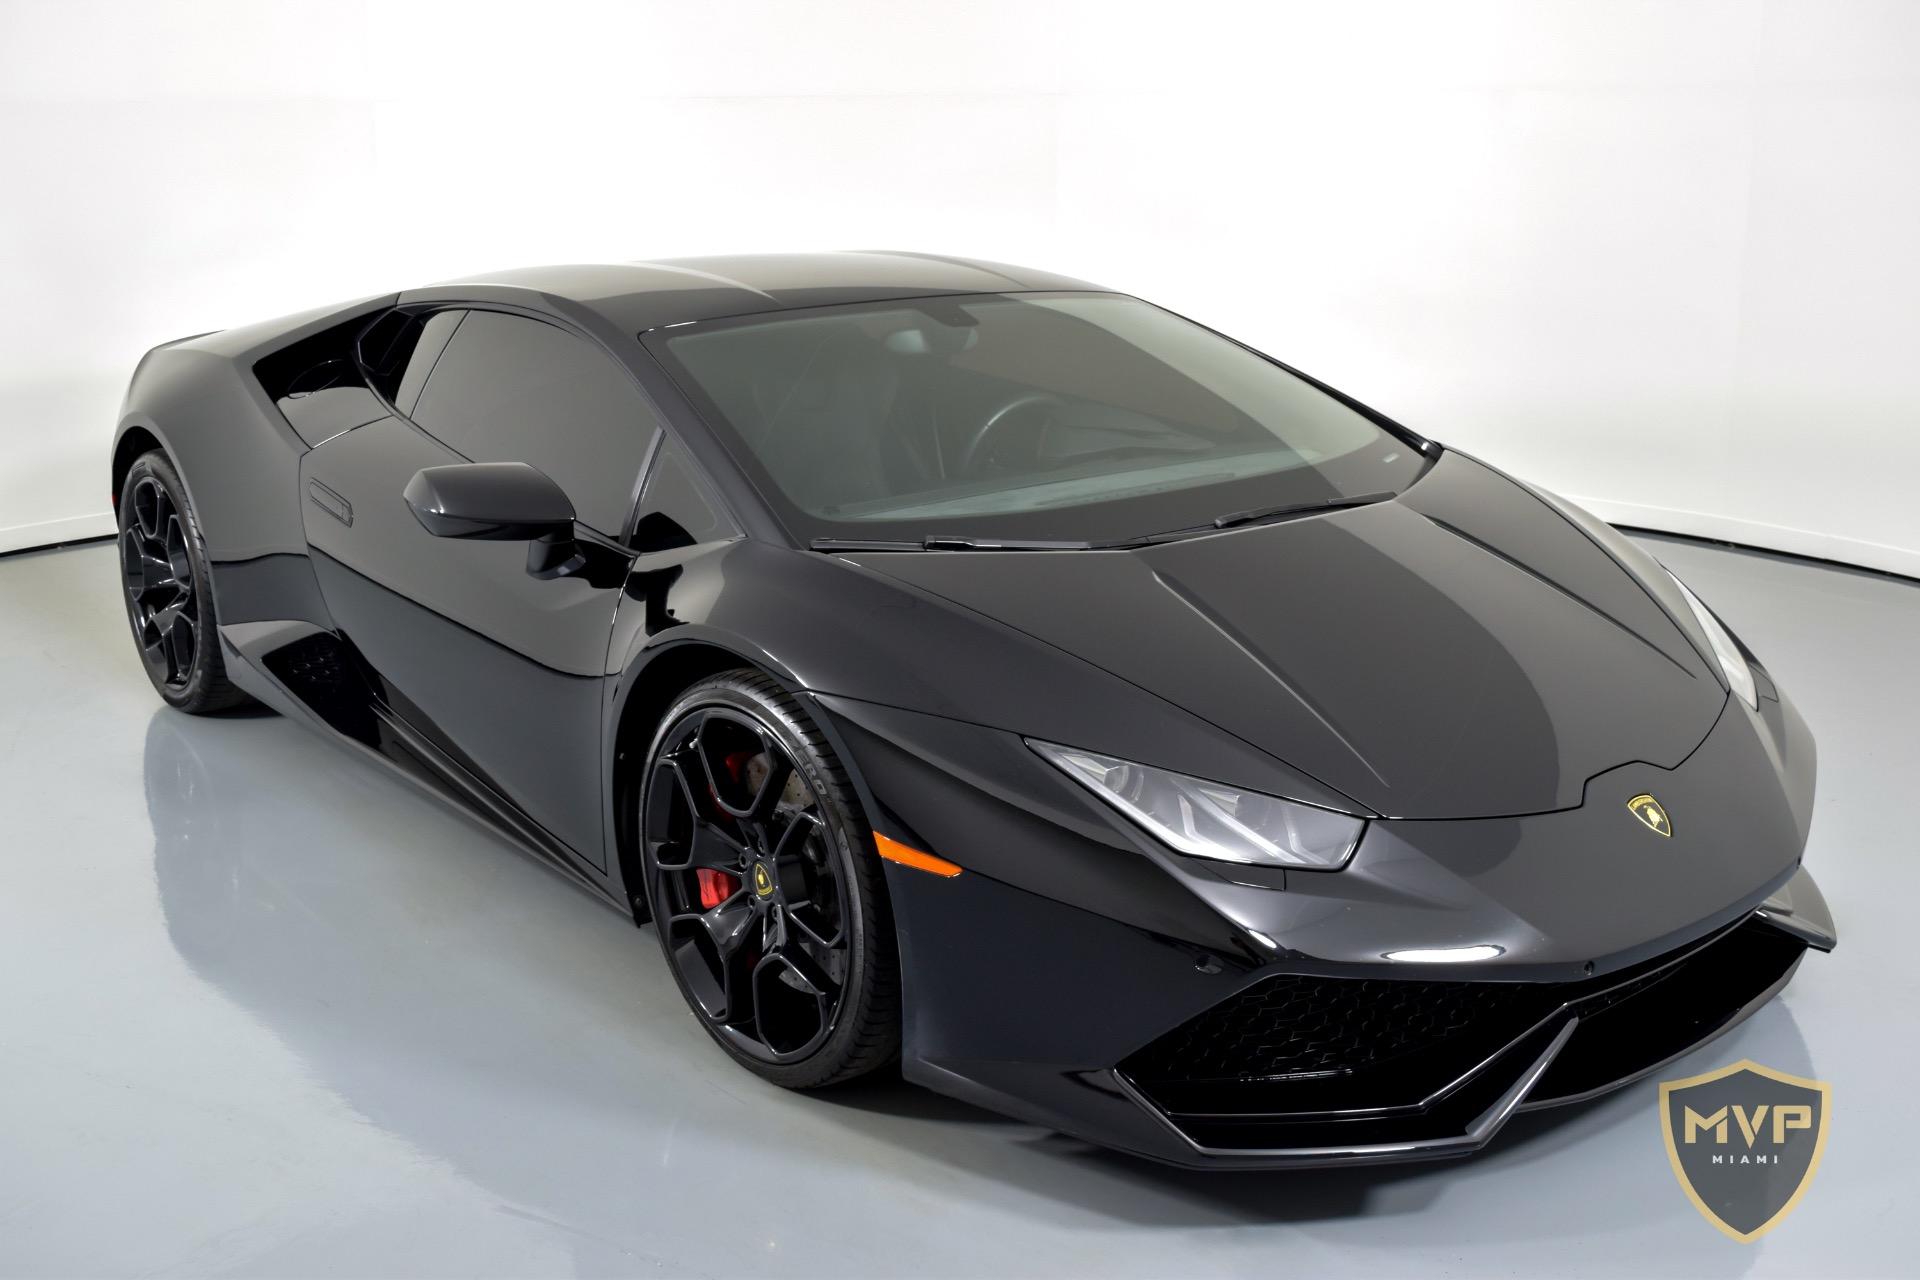 Used 2017 Lamborghini Huracan 580 2 For Sale 1 299 Mvp Atlanta Stock A06782